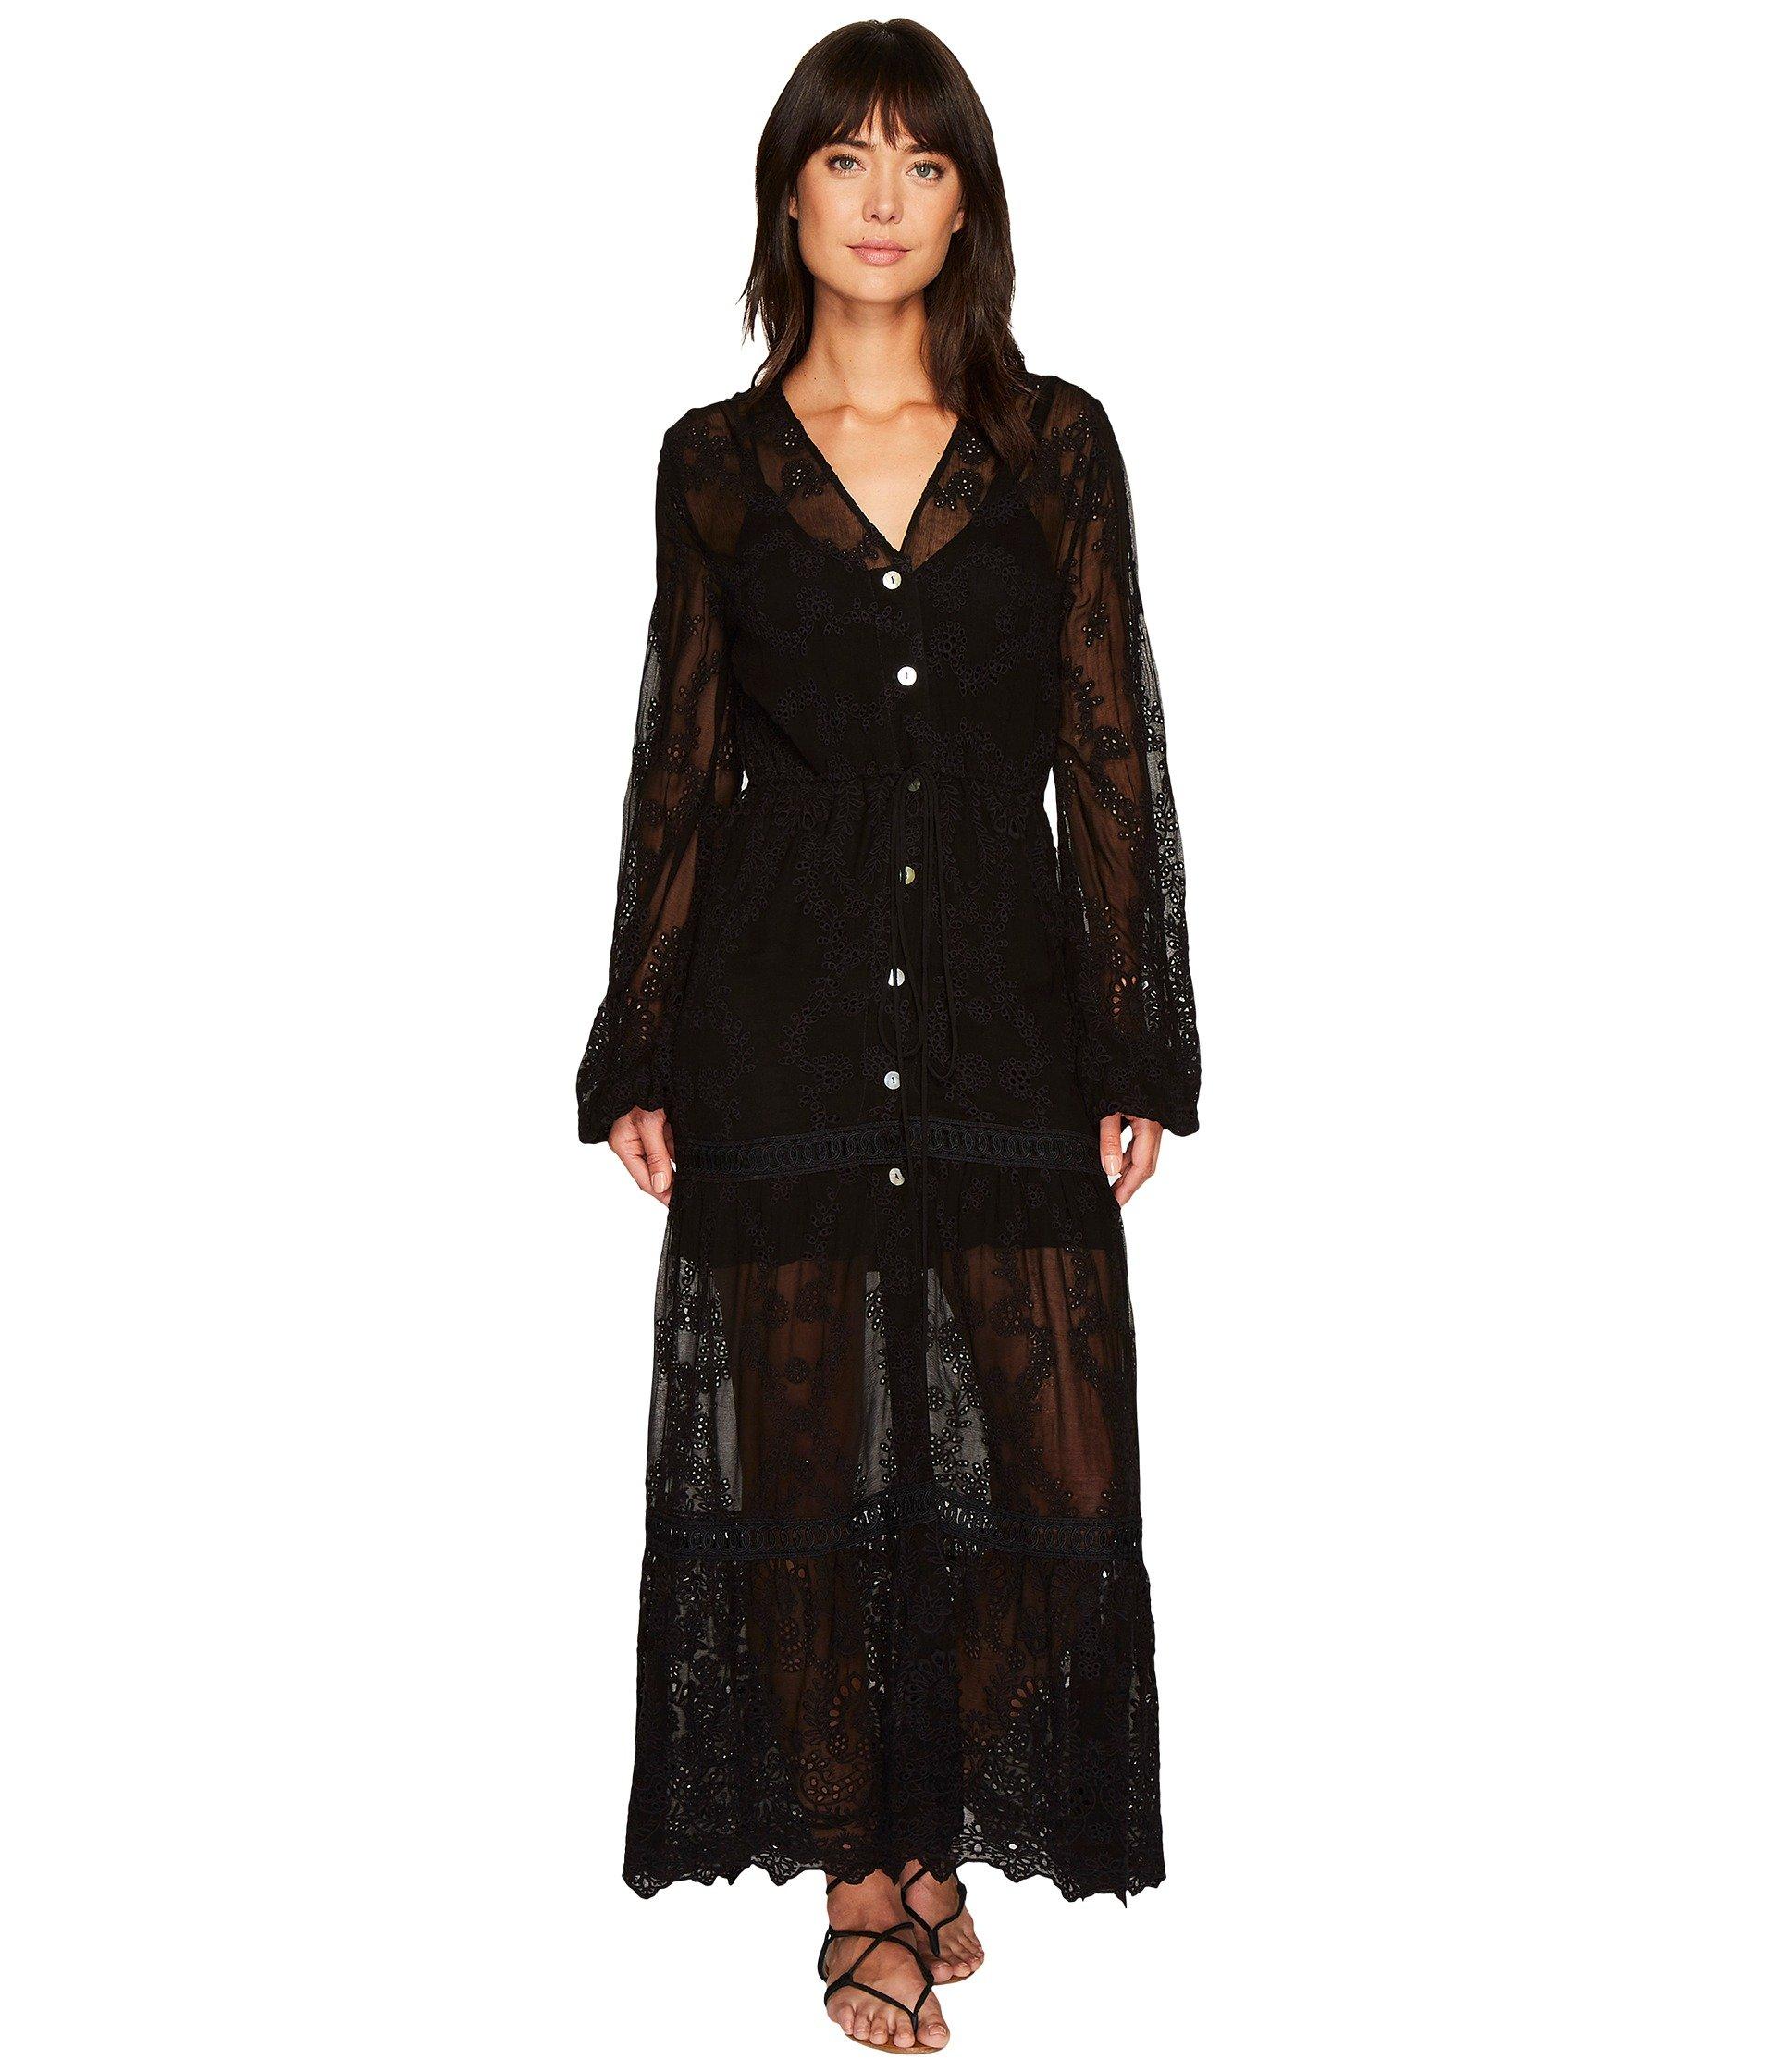 JEN'S PIRATE BOOTY Nicobar Dress Duster, Black Eyelet